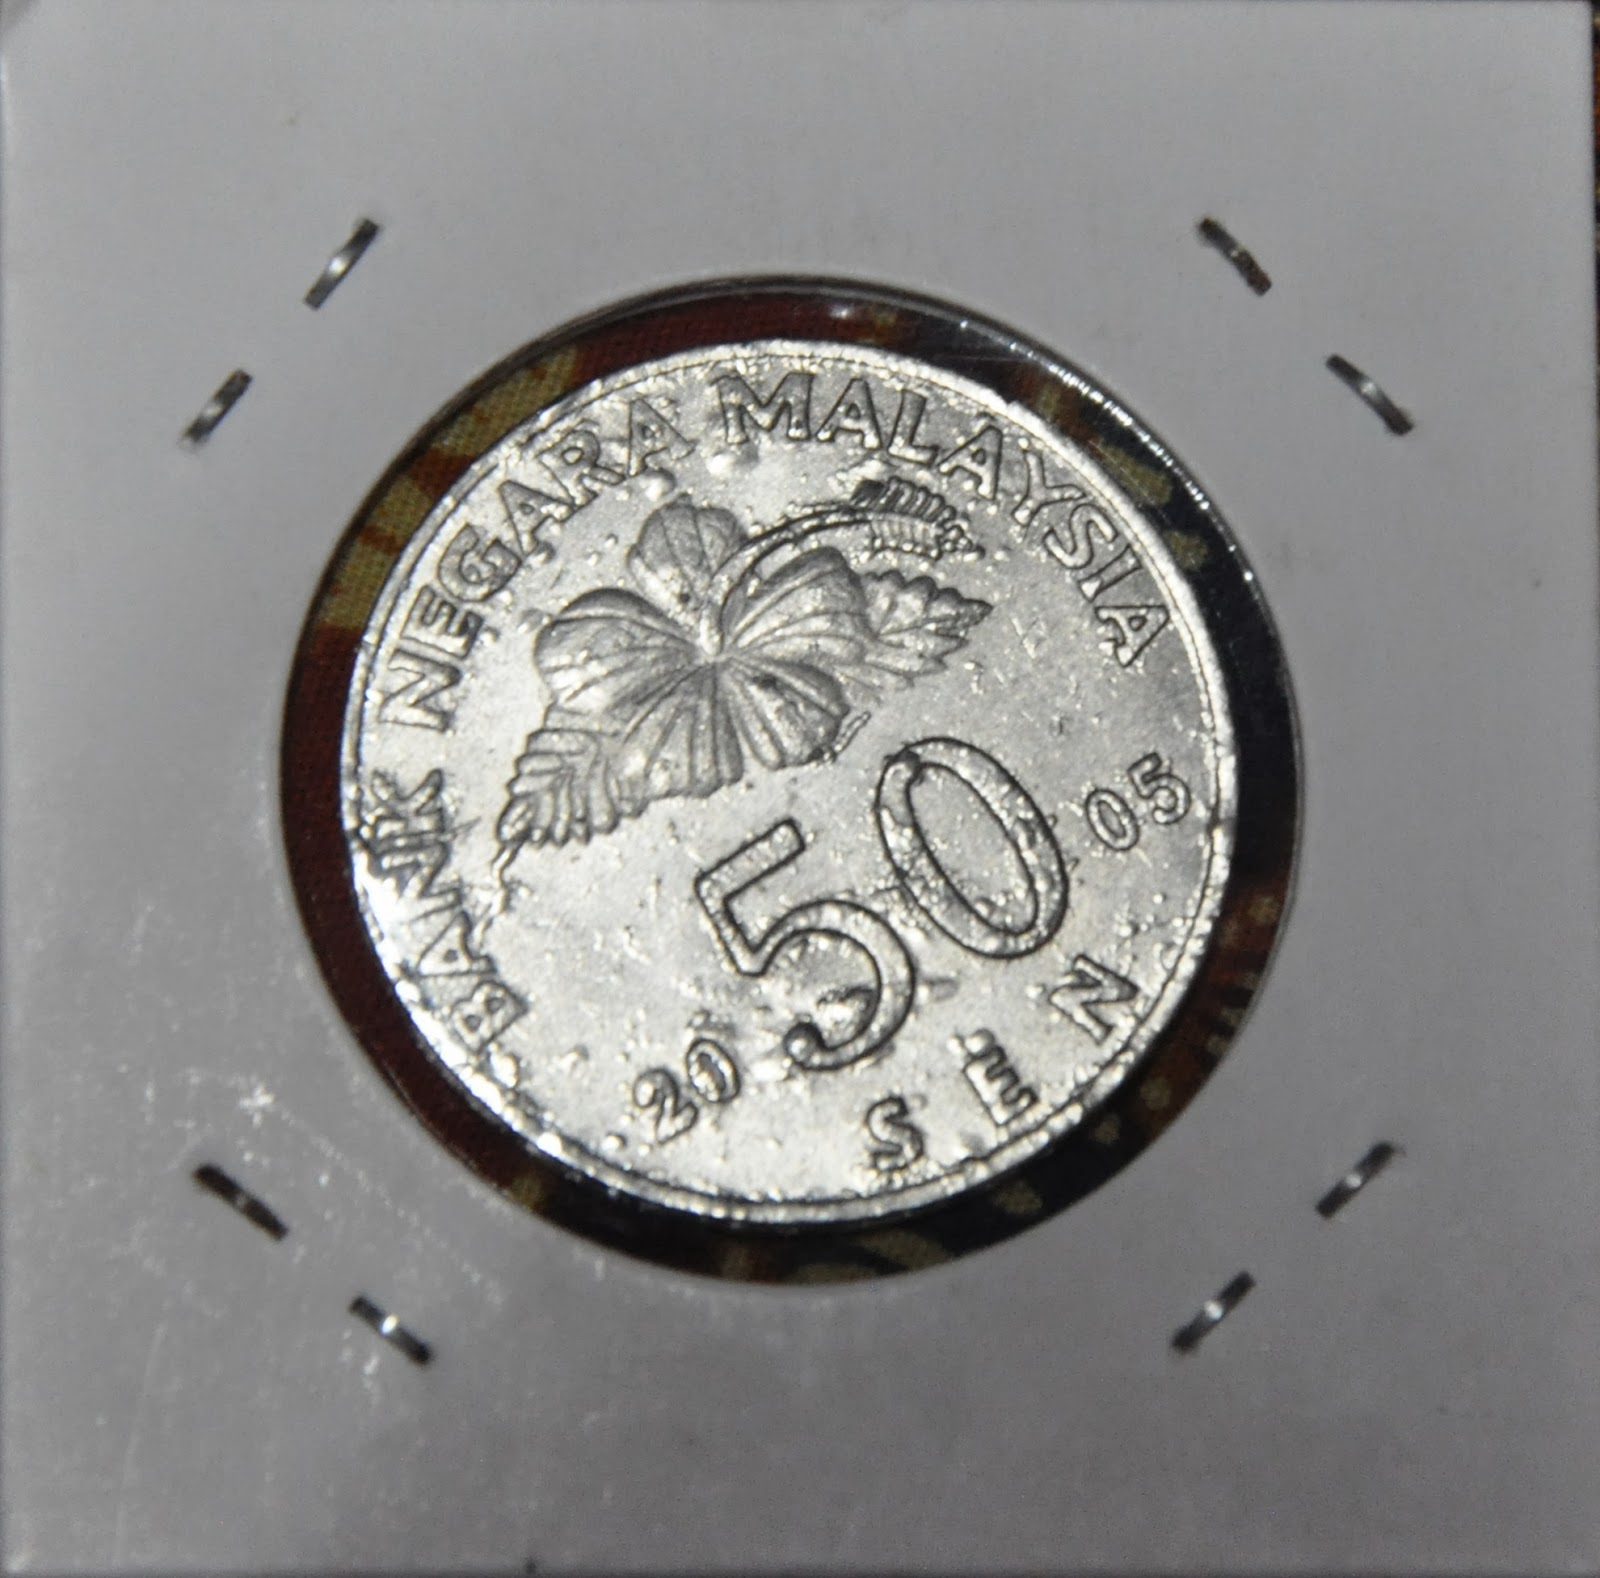 Malaysia 1 Sen Coin Types And Series | MalaysiaCoin